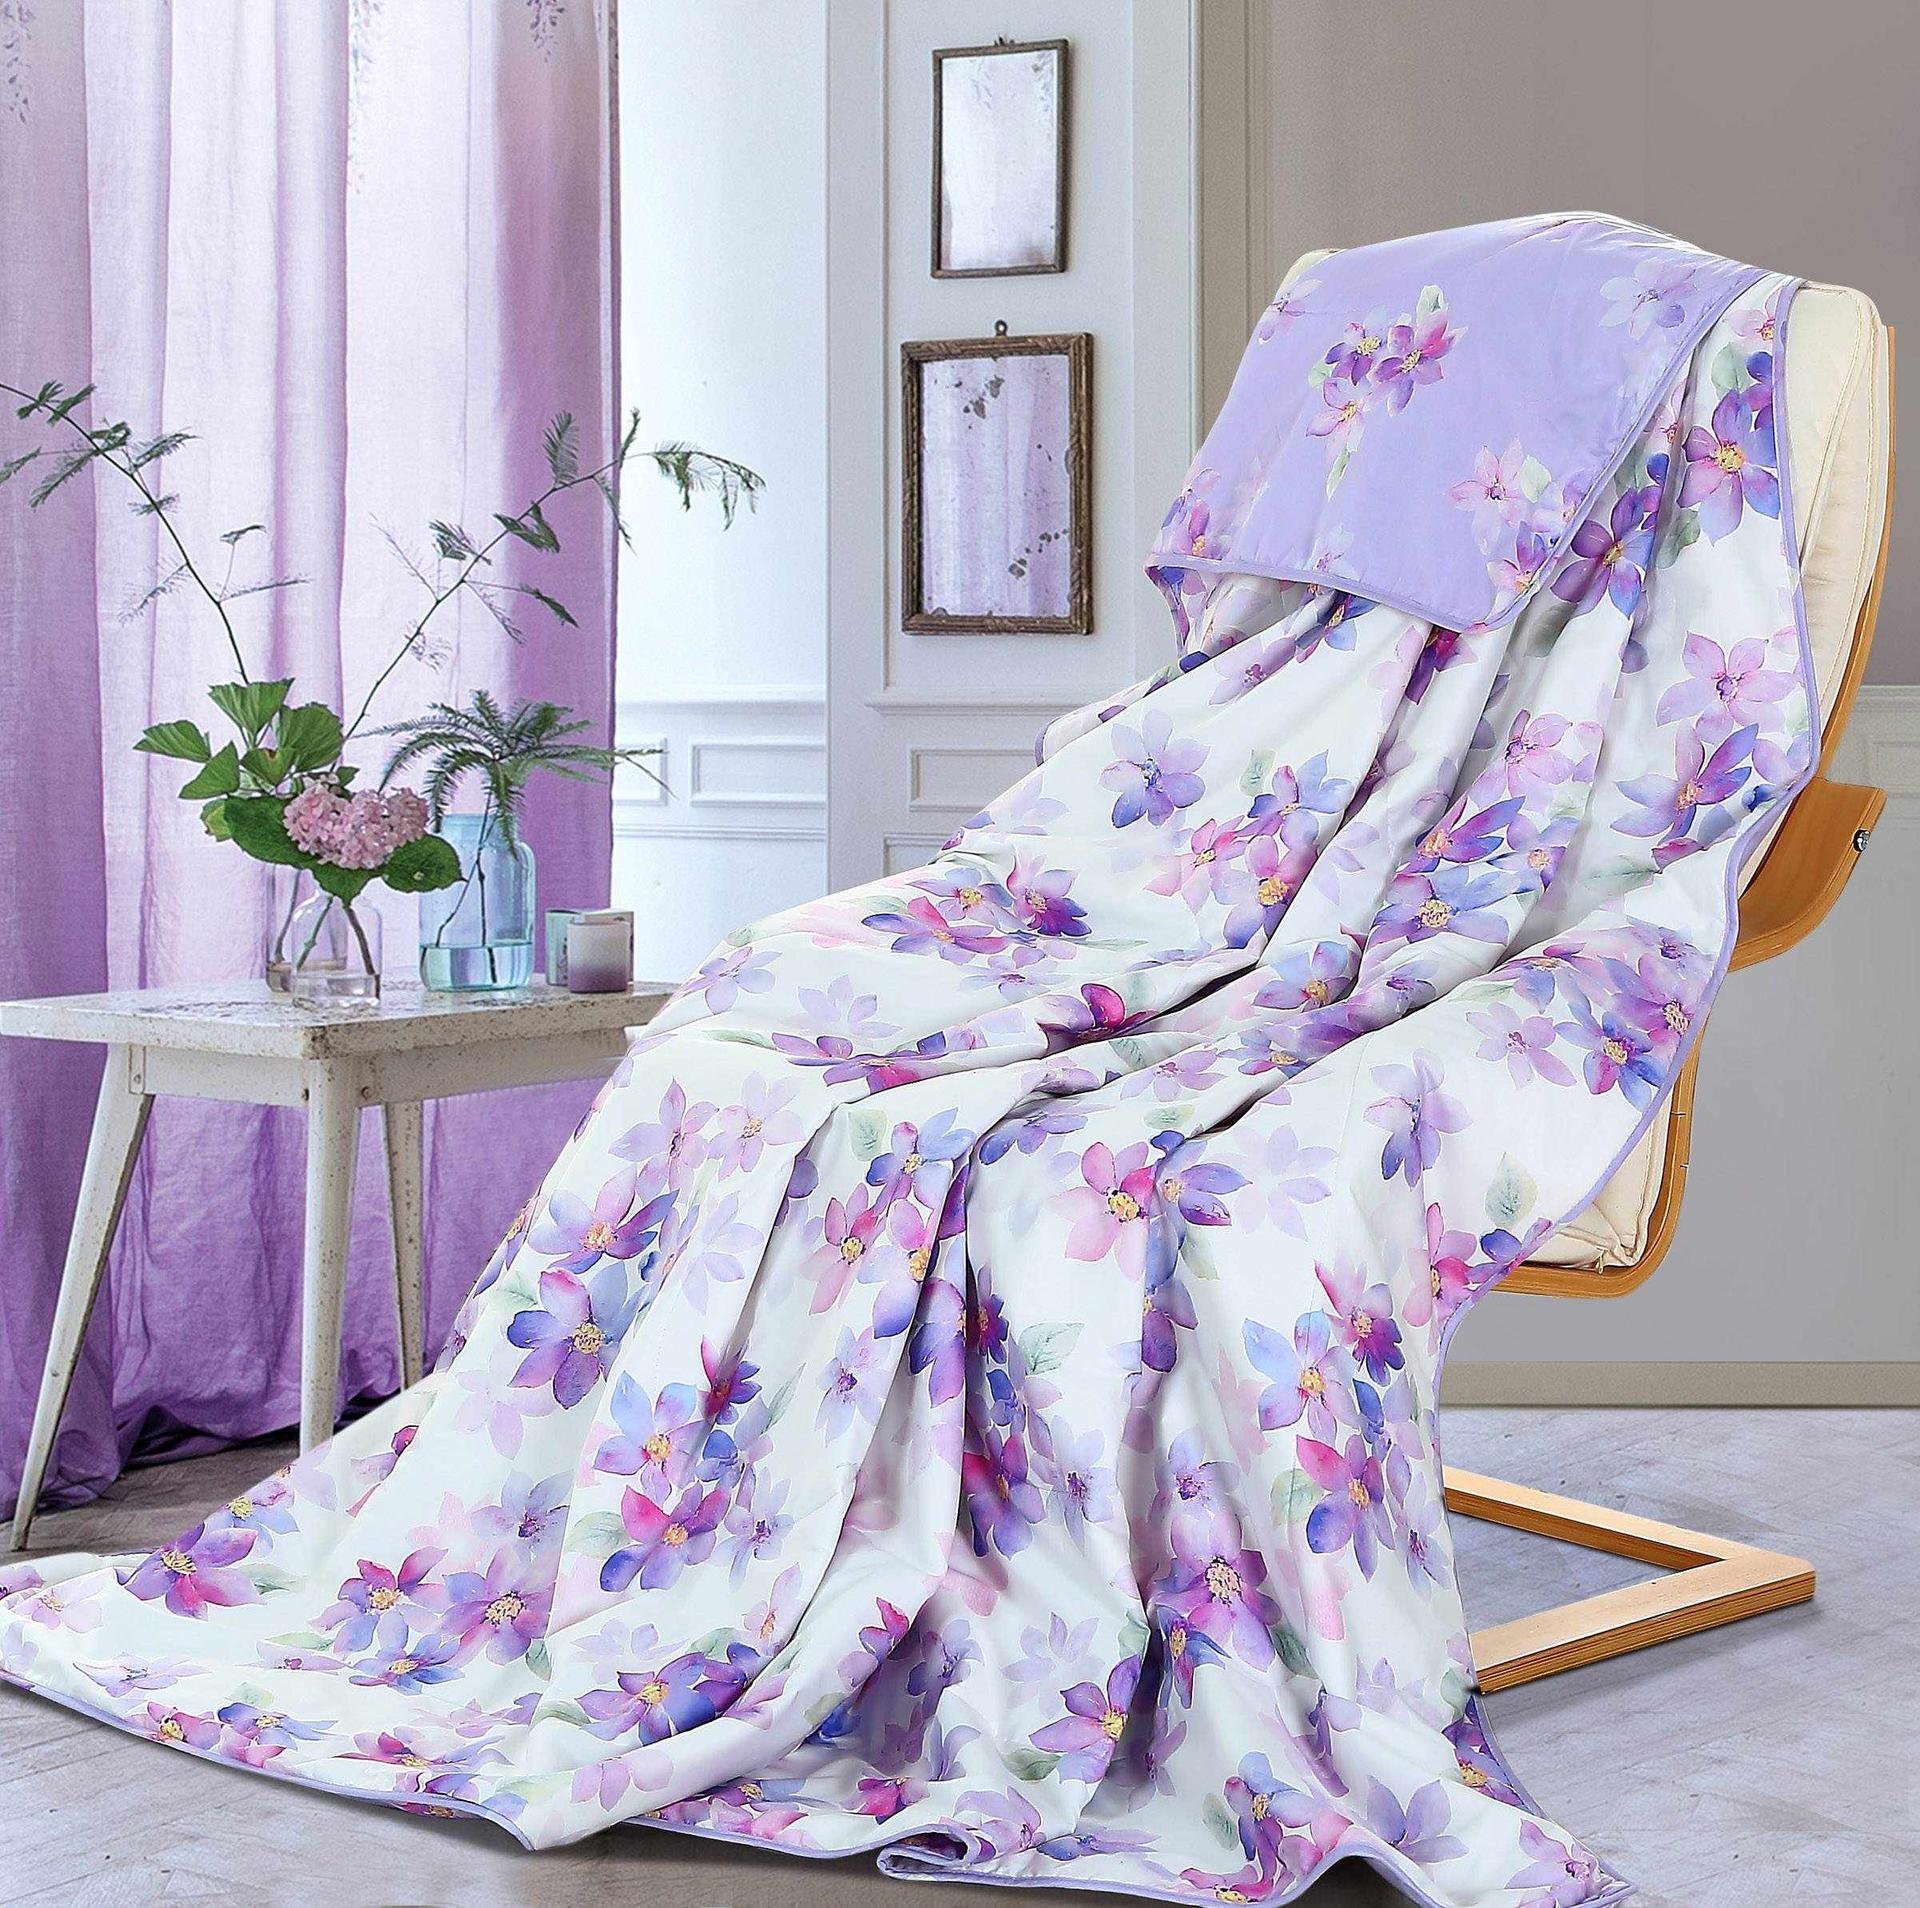 Summer Comforter Pigment Printing 200TC Cotton